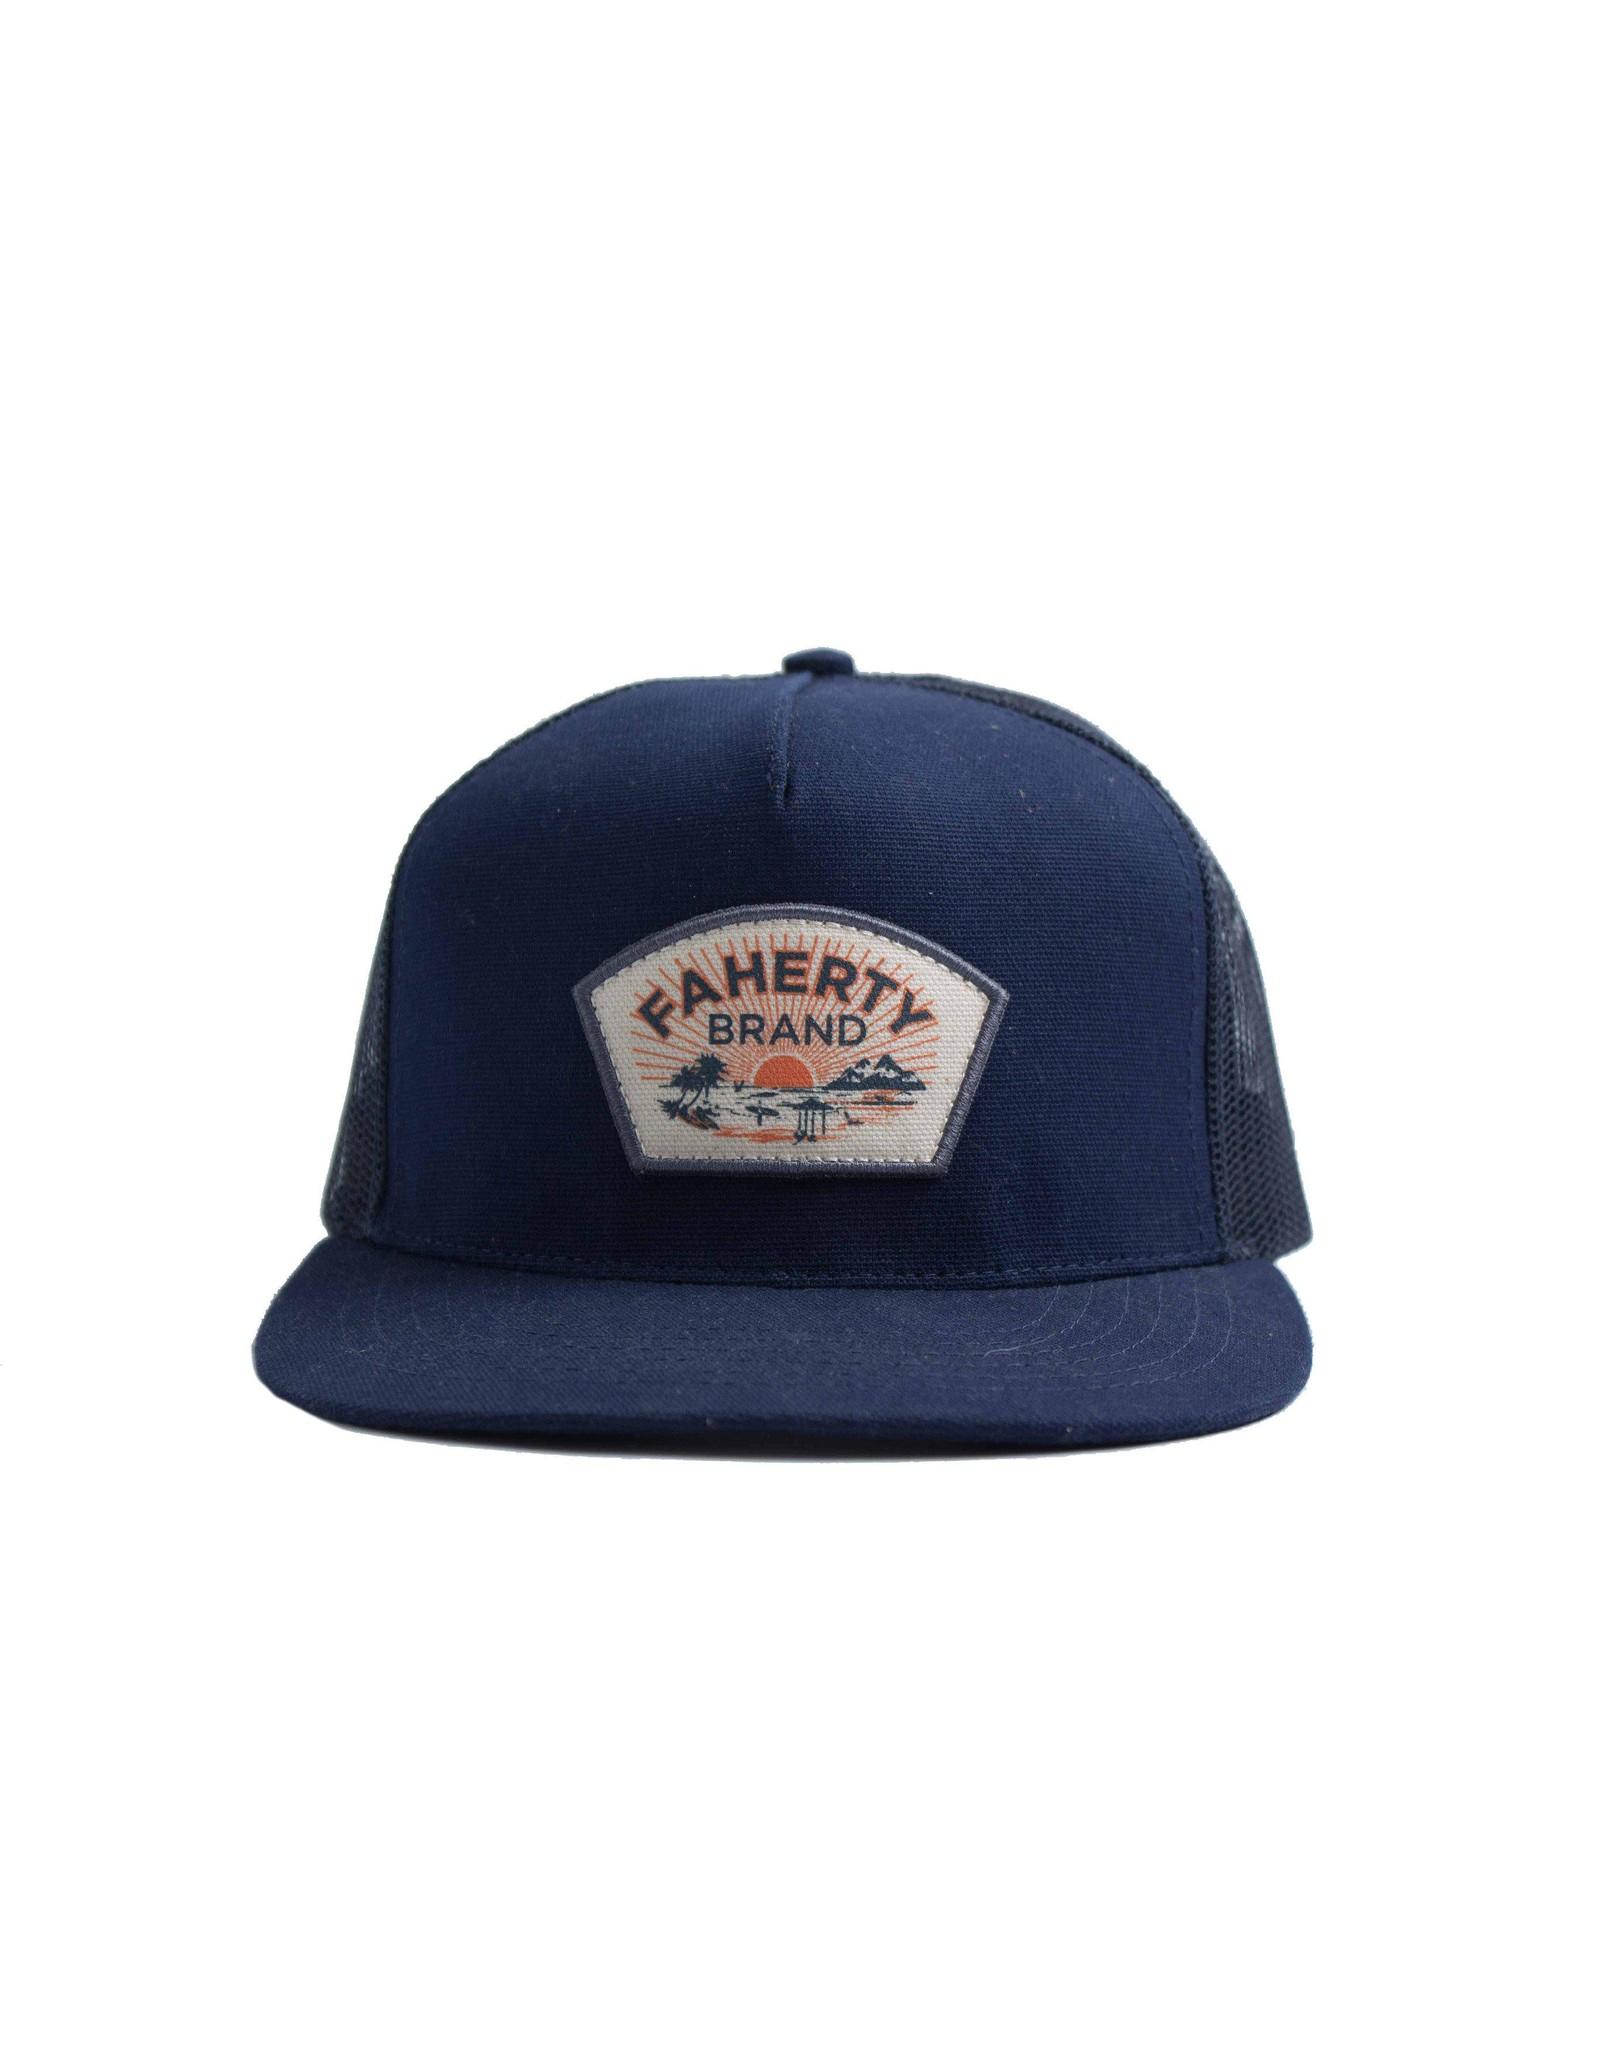 Faherty 5 Panel Trucker Hat